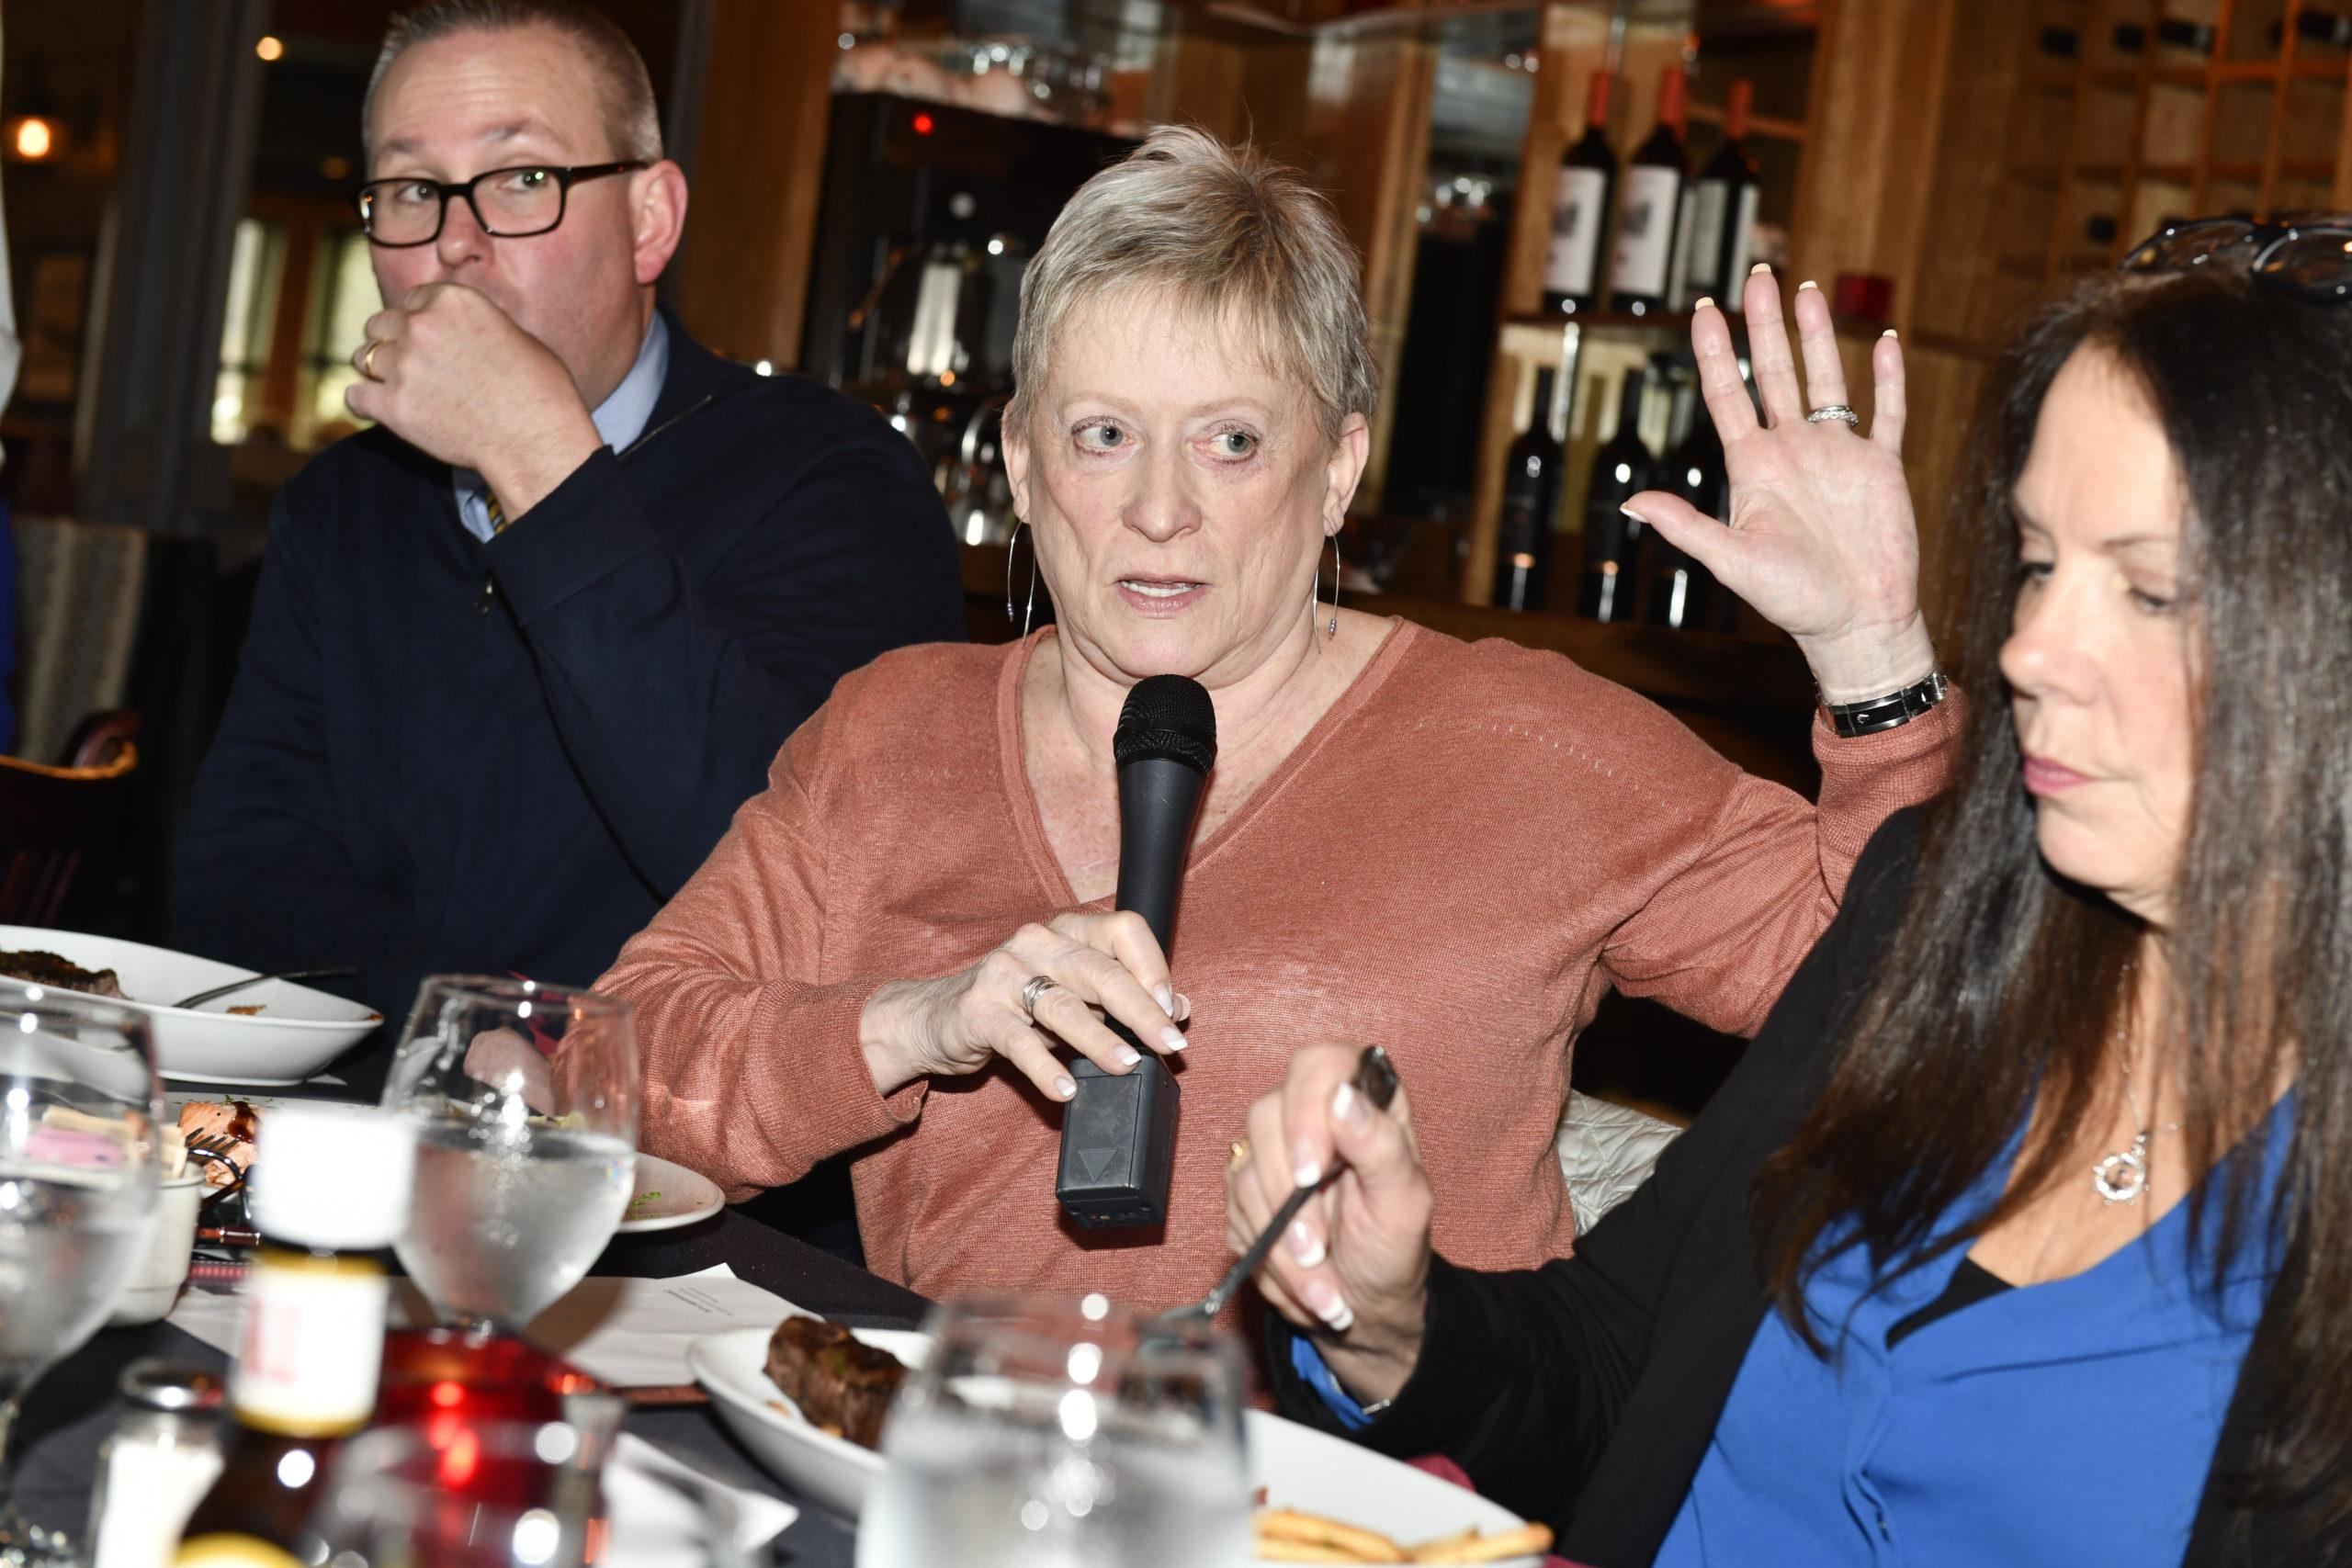 Joyce King poses a question.  DANA SHAW